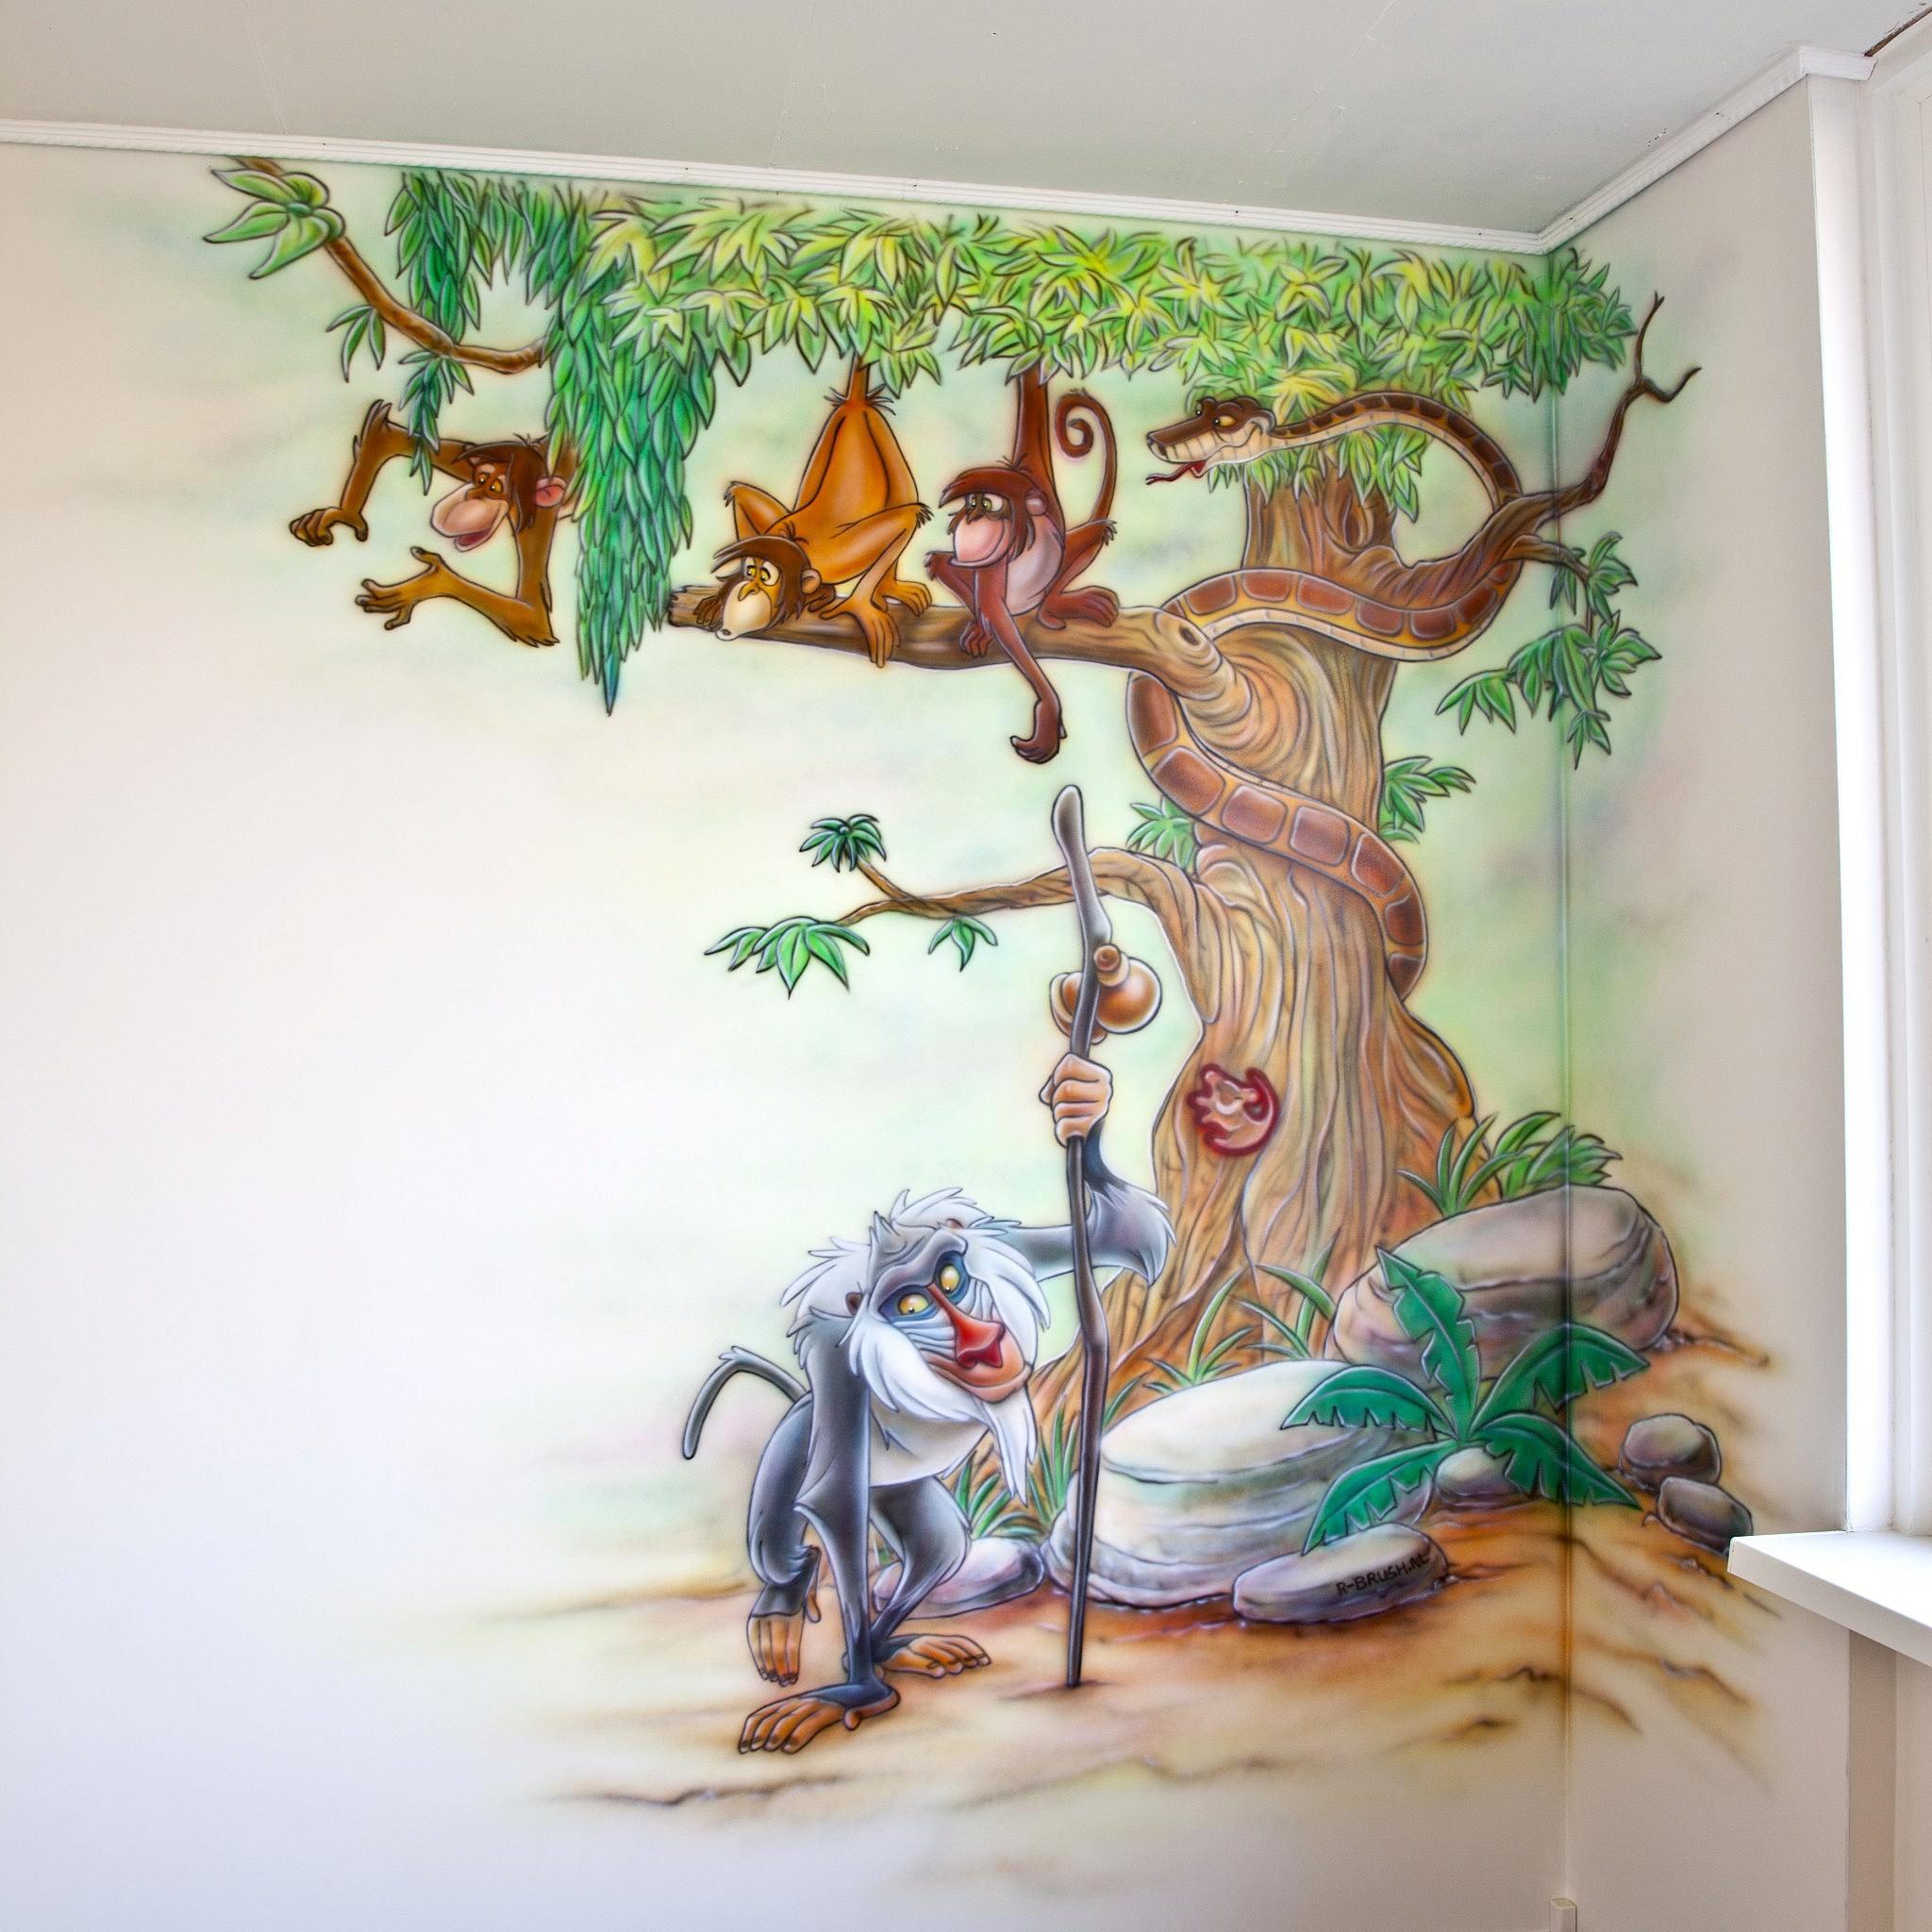 Muurschildering Jungle boom kinderkamer